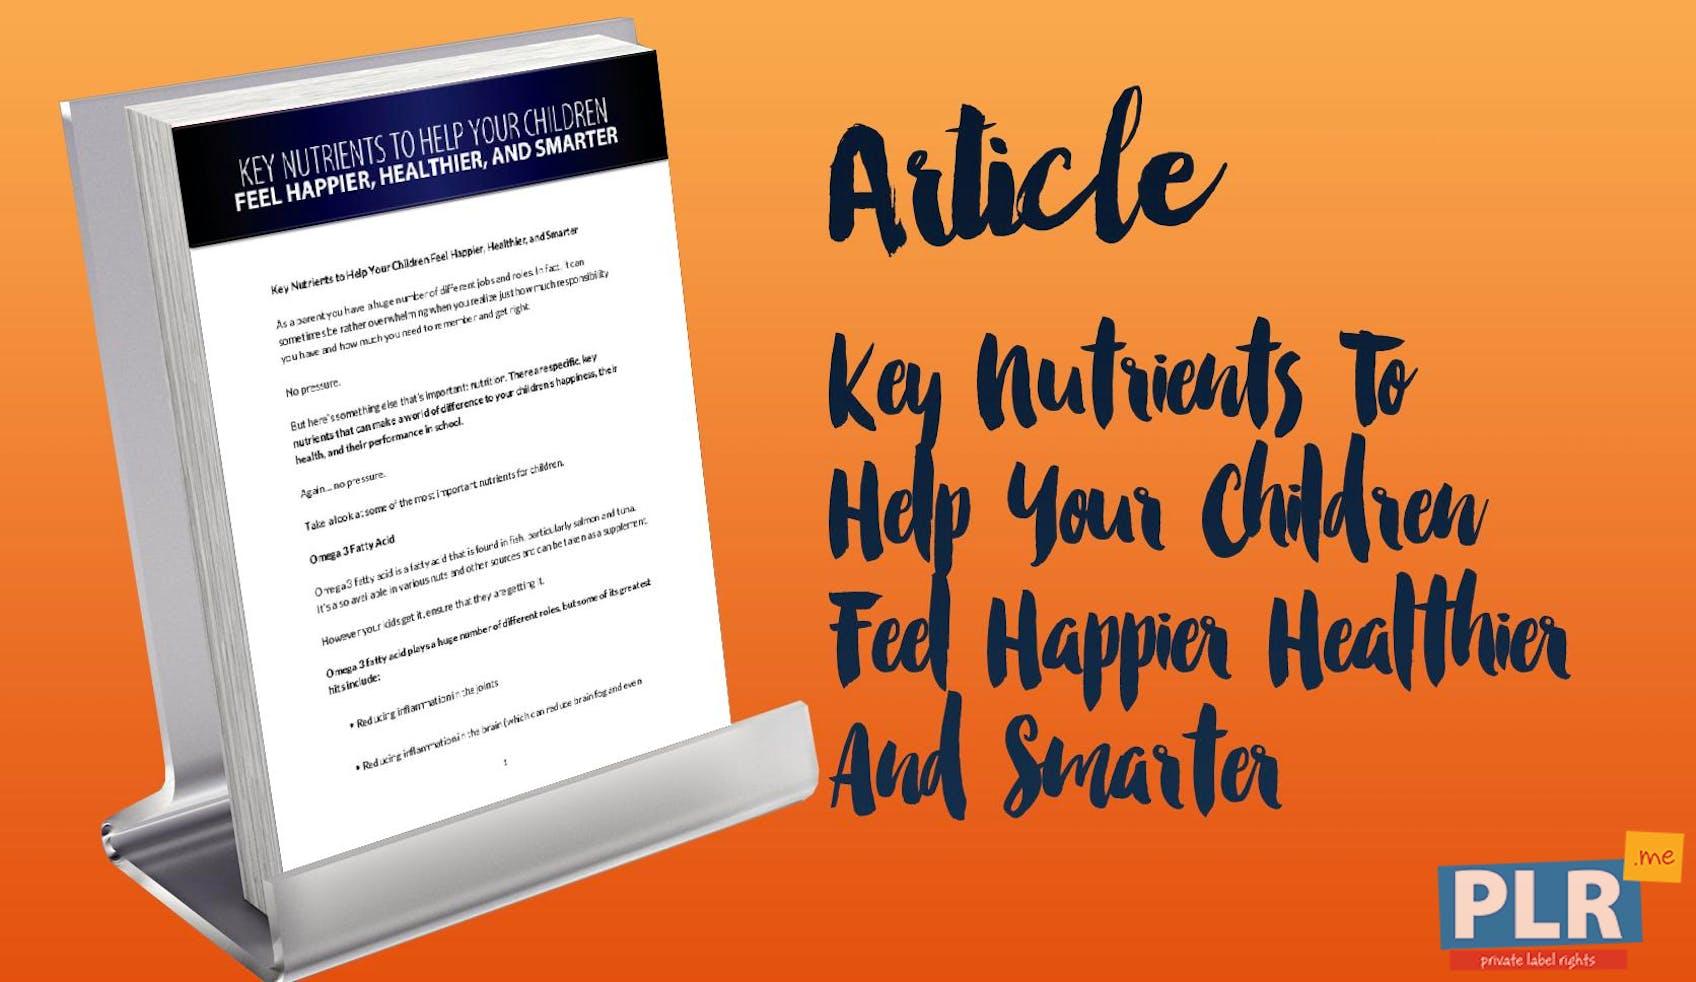 Key Nutrients To Help Your Children Feel Happier Healthier And Smarter